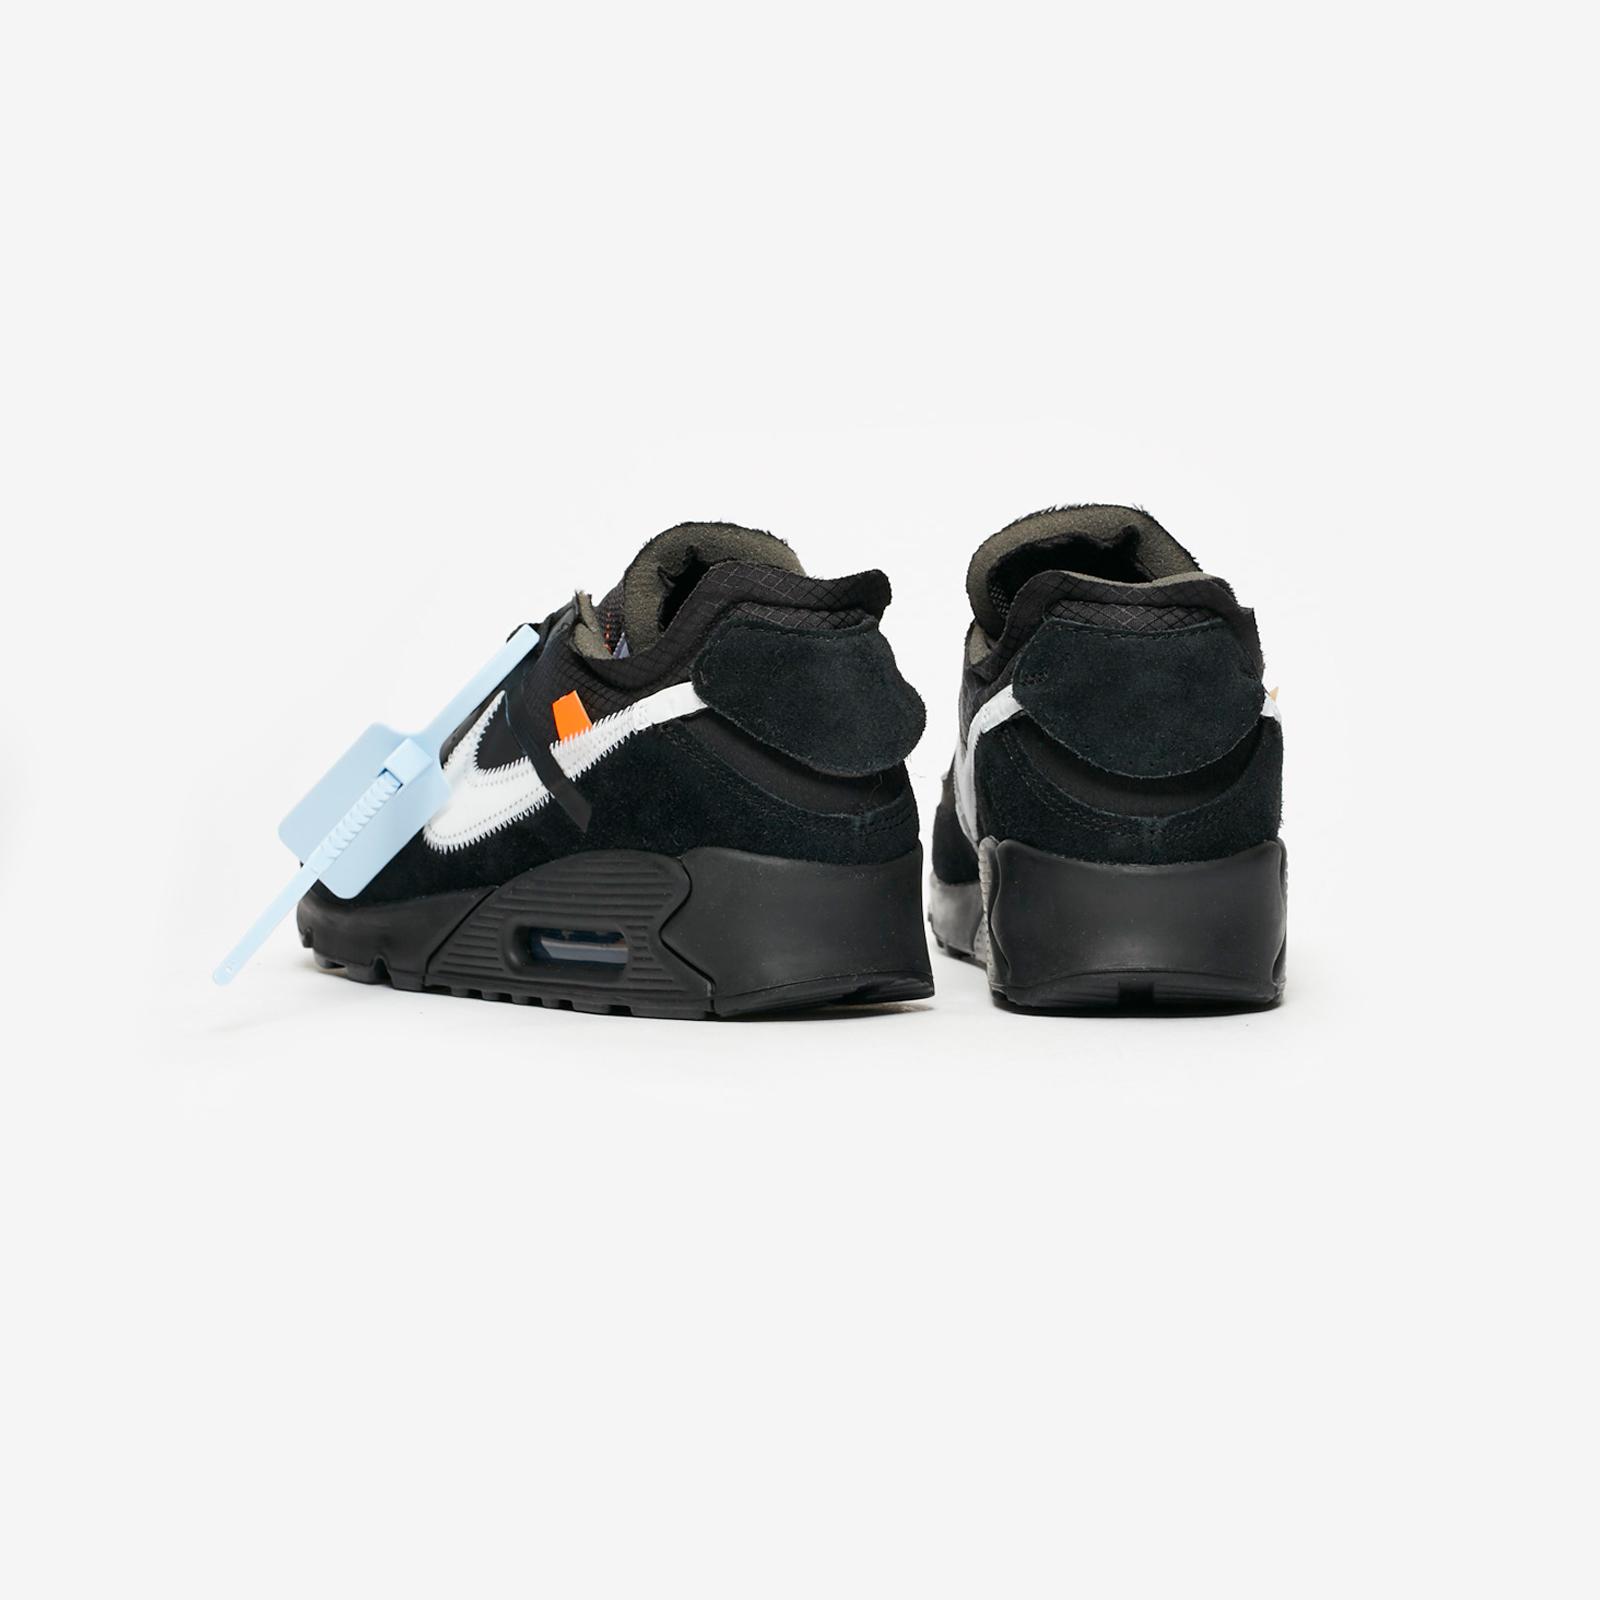 Nike The 10: Air Max 90 Aa7293 001 Sneakersnstuff